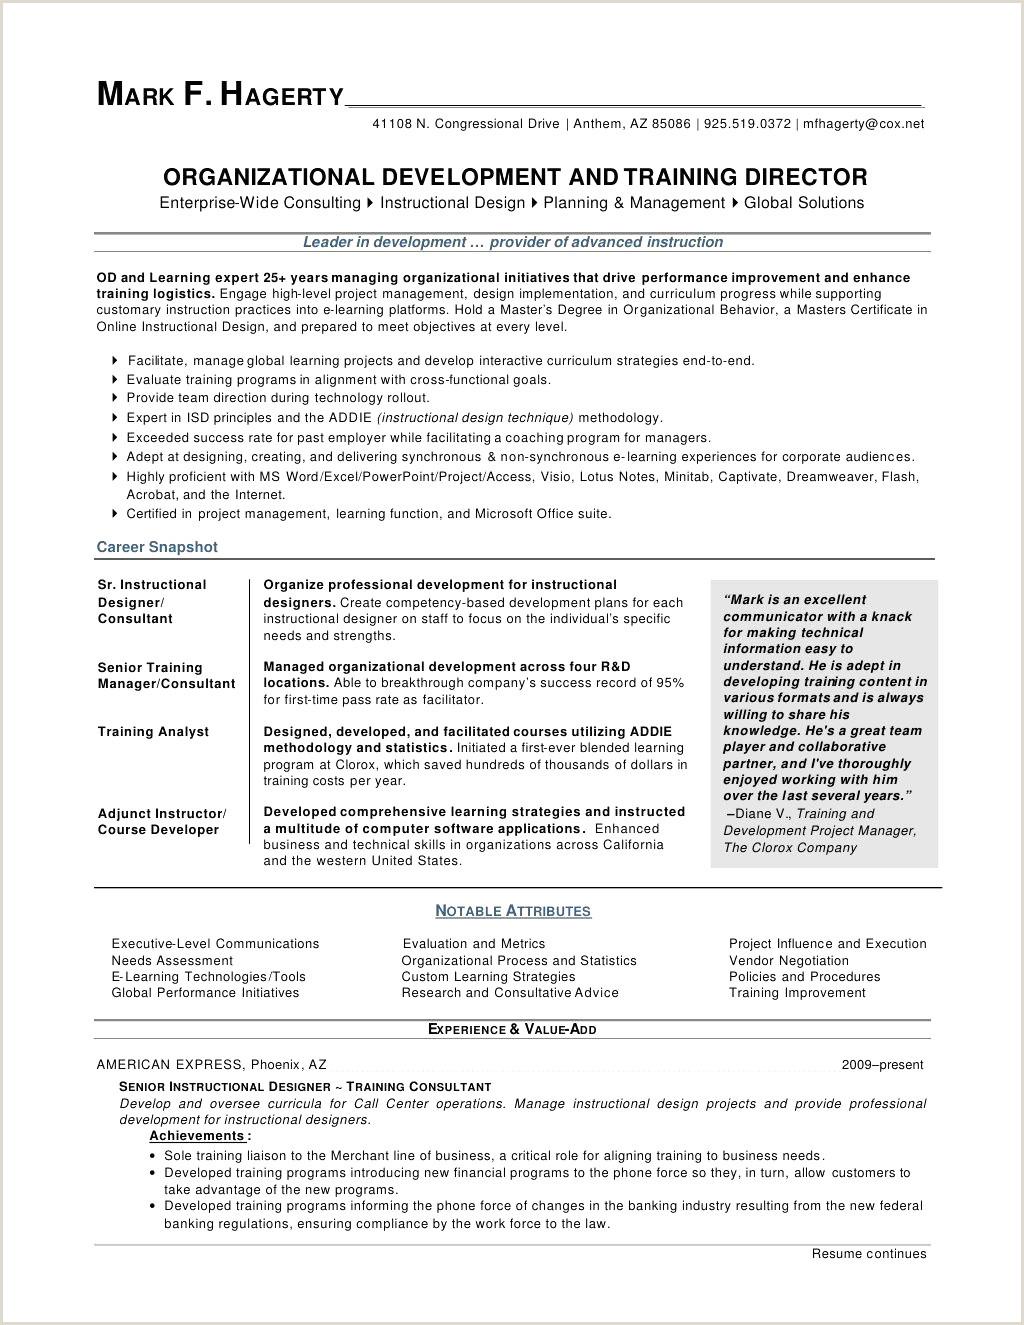 Job Application Cv Format For Job Cv For Job Gratuit Prehensive Cv Template First Time Resume